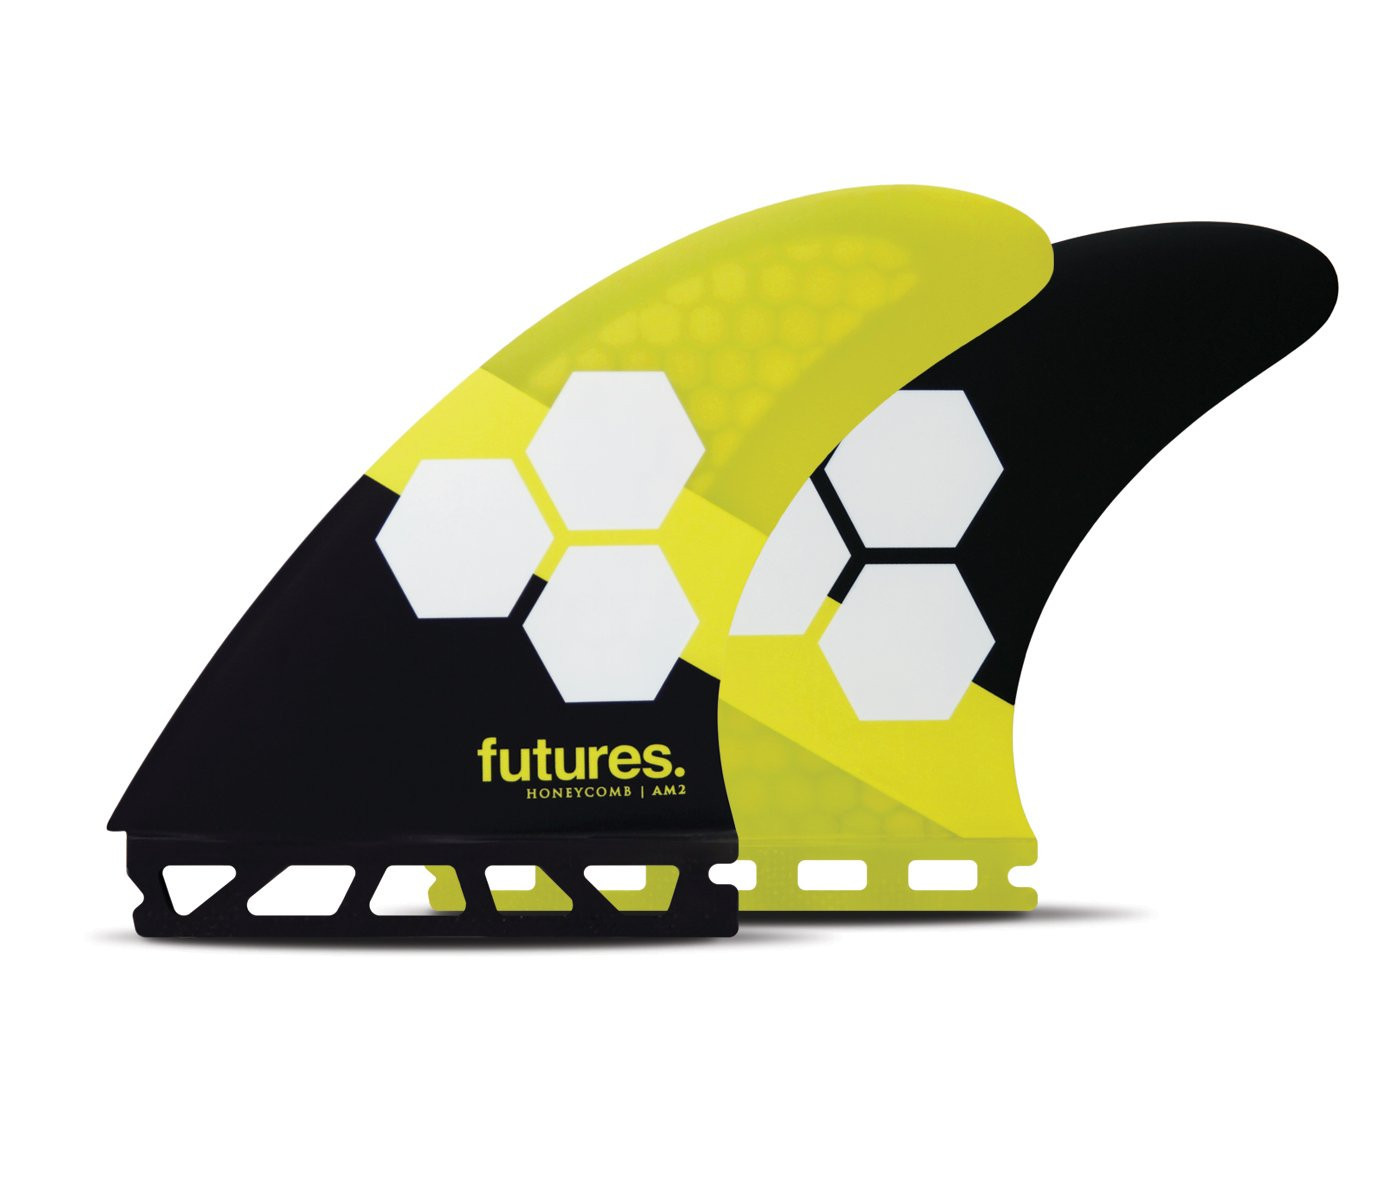 FAM2 RTM Hex Yellow & Black